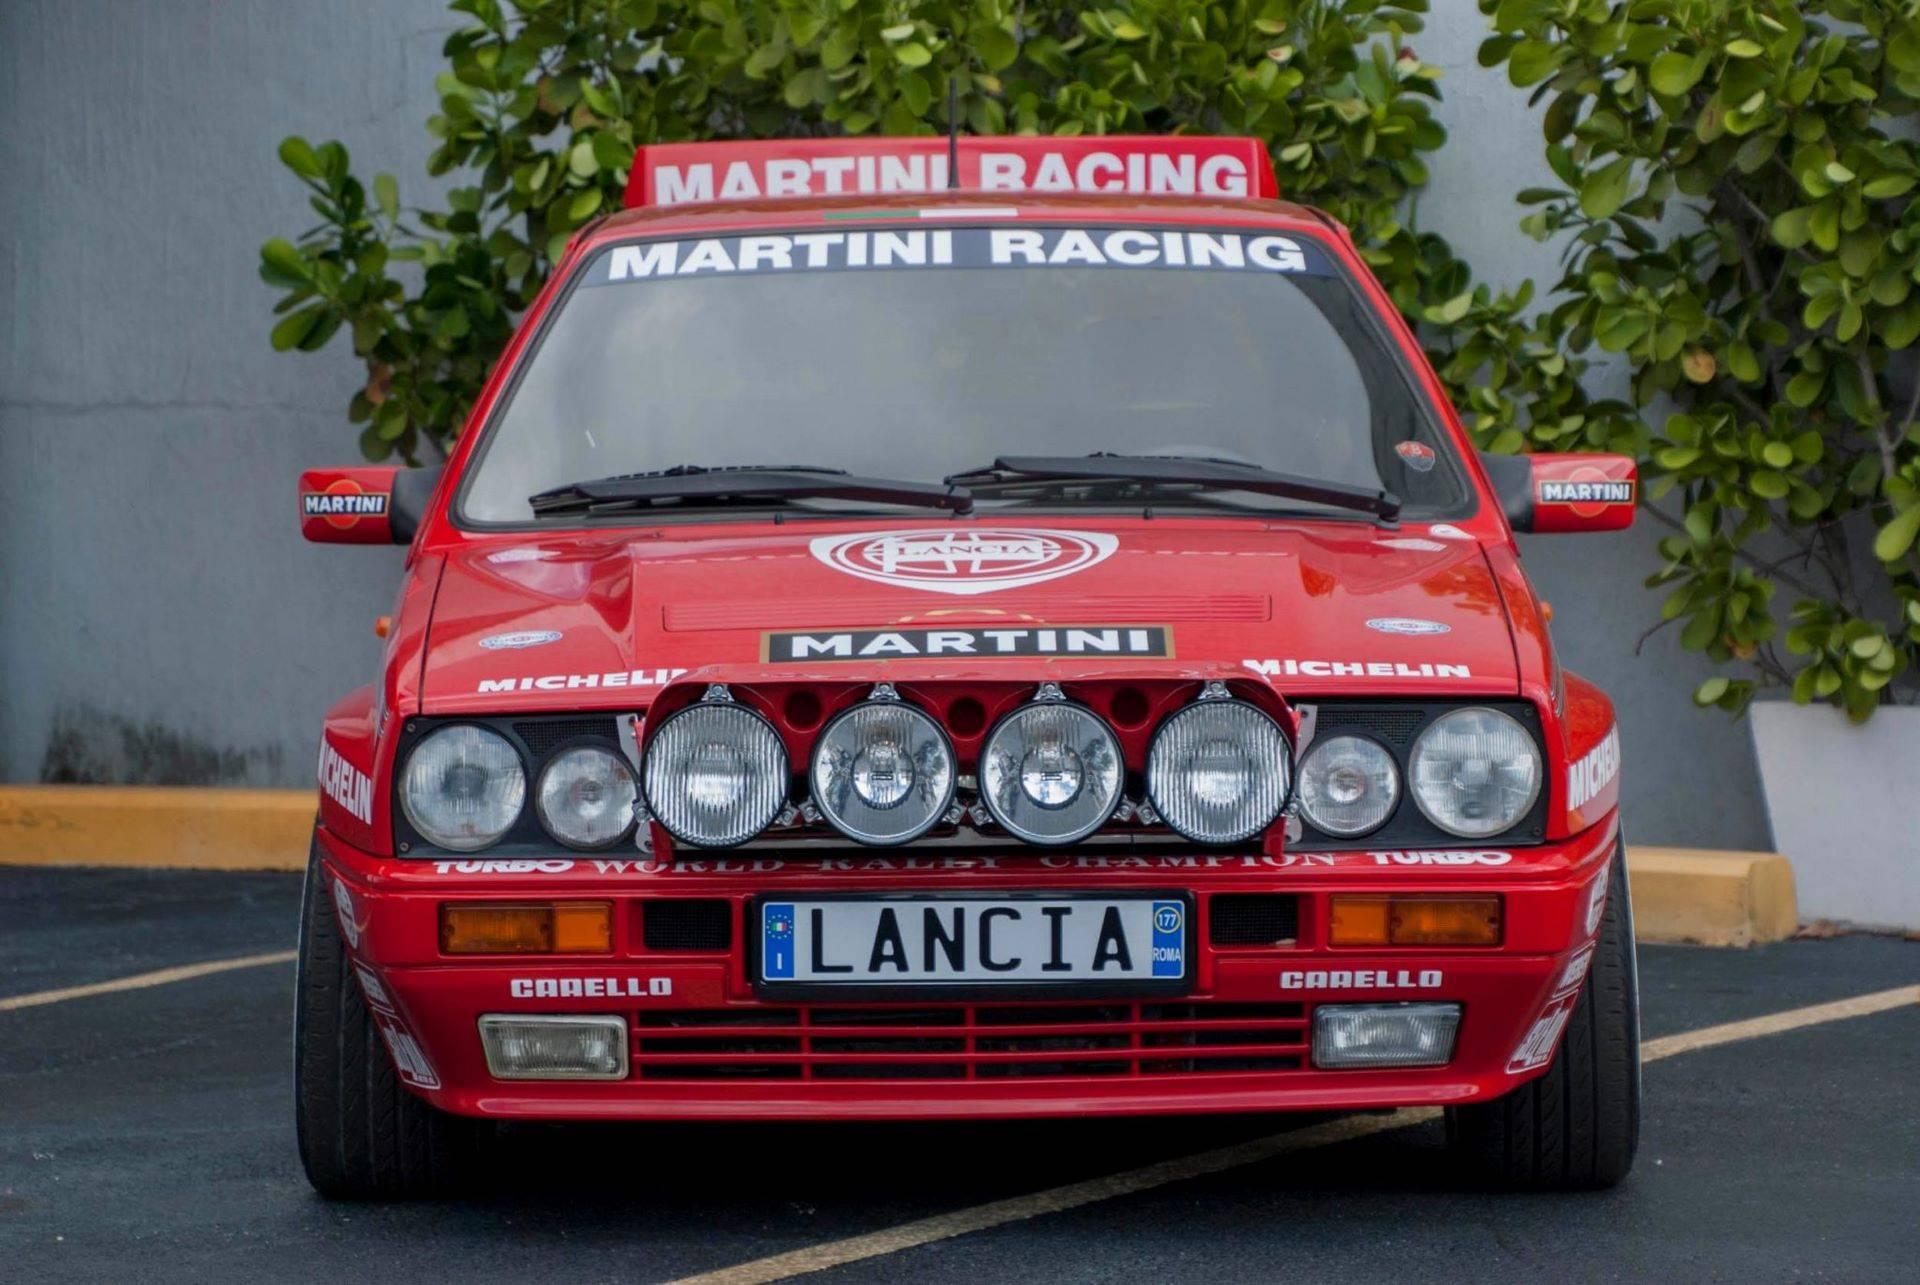 Lancia-Delta-Integrale-8V-1989-3